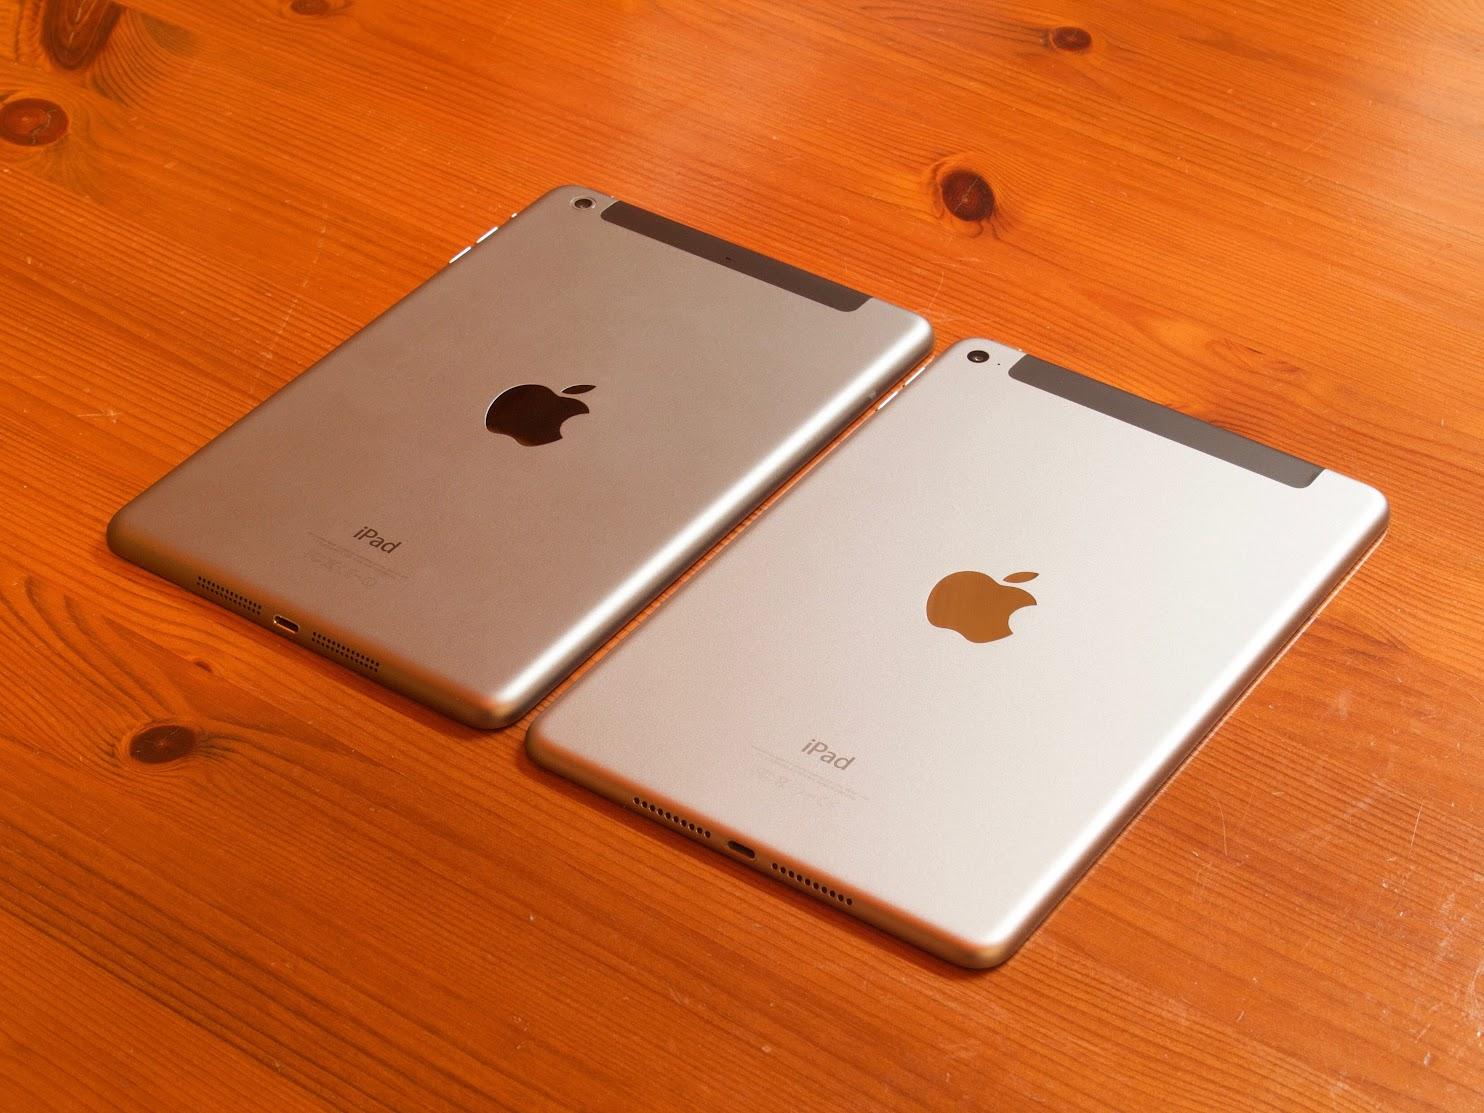 iPad mini 2 Wi-Fi + Cellular and iPad mini 4 Wi-Fi + Cellular